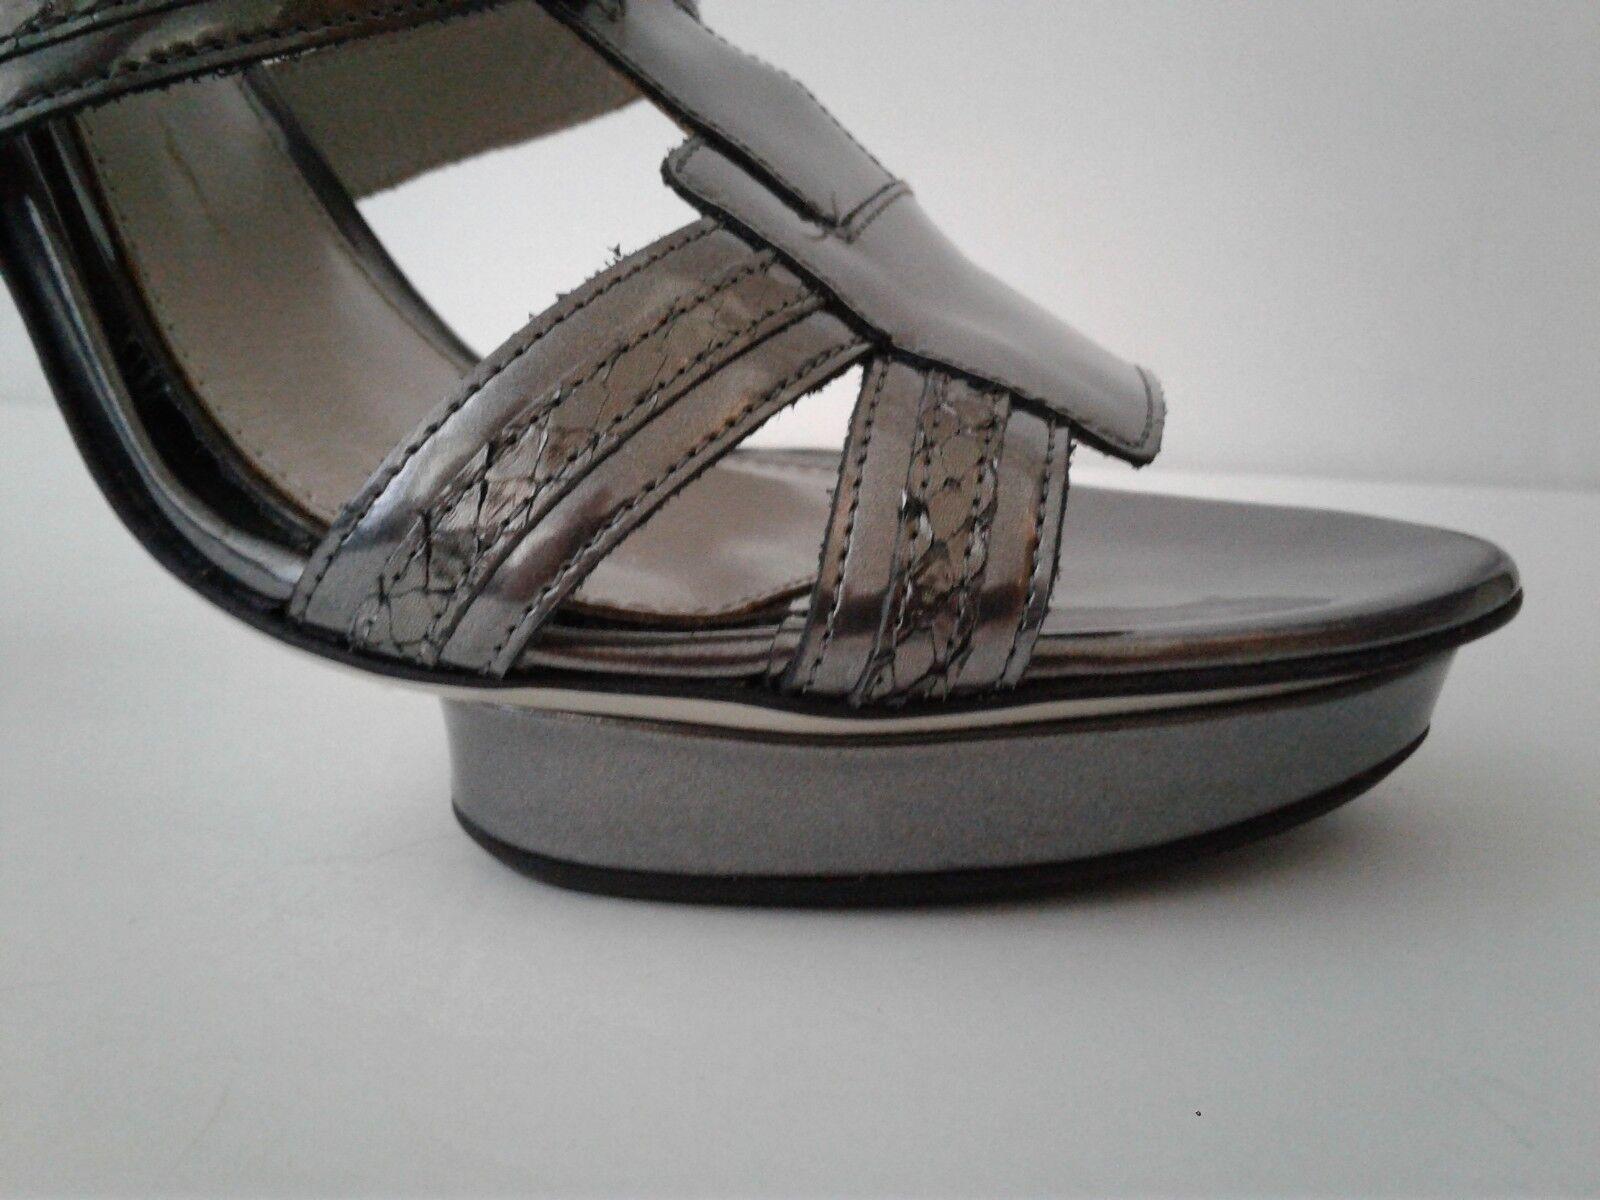 JASON WU WU WU Carolyn 2 Platform Sandals, (Metallic Silber), Größe 9 -9.5 US - 39.5 EU 7b19e7